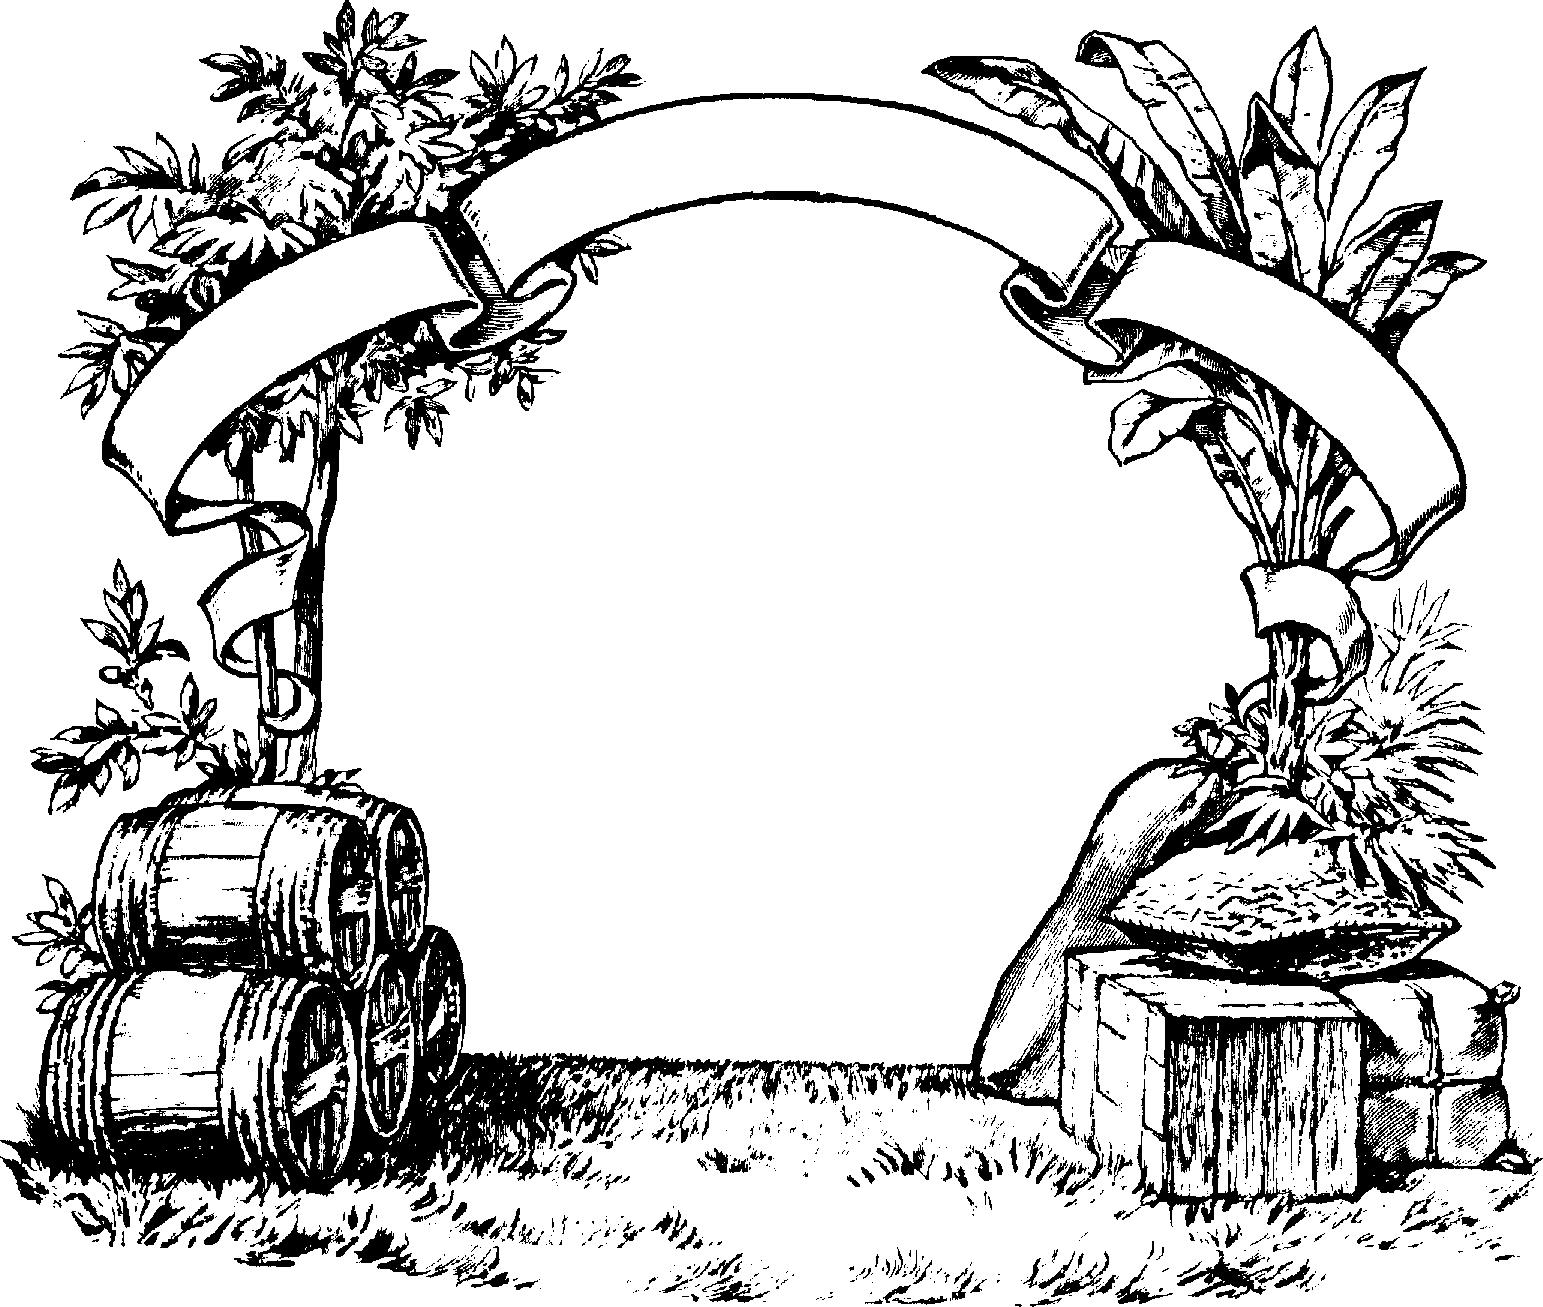 Harvest clipart black and white jpg free Free Harvest Pictures, Download Free Clip Art, Free Clip Art on ... jpg free